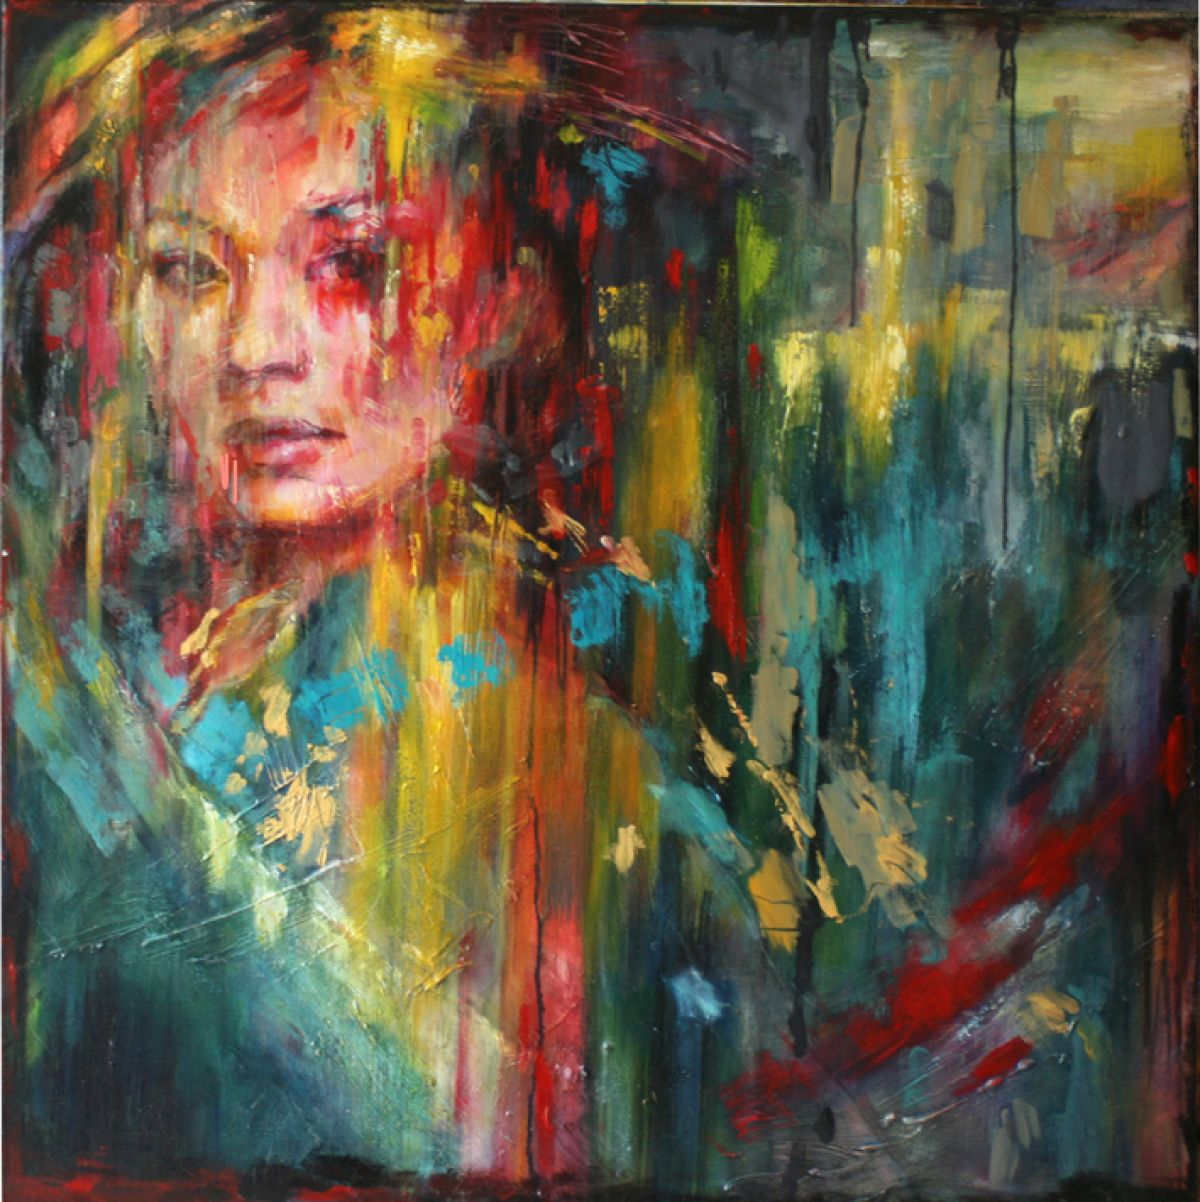 Kunst: Misaki van kunstenaar Evelyn Hamilton